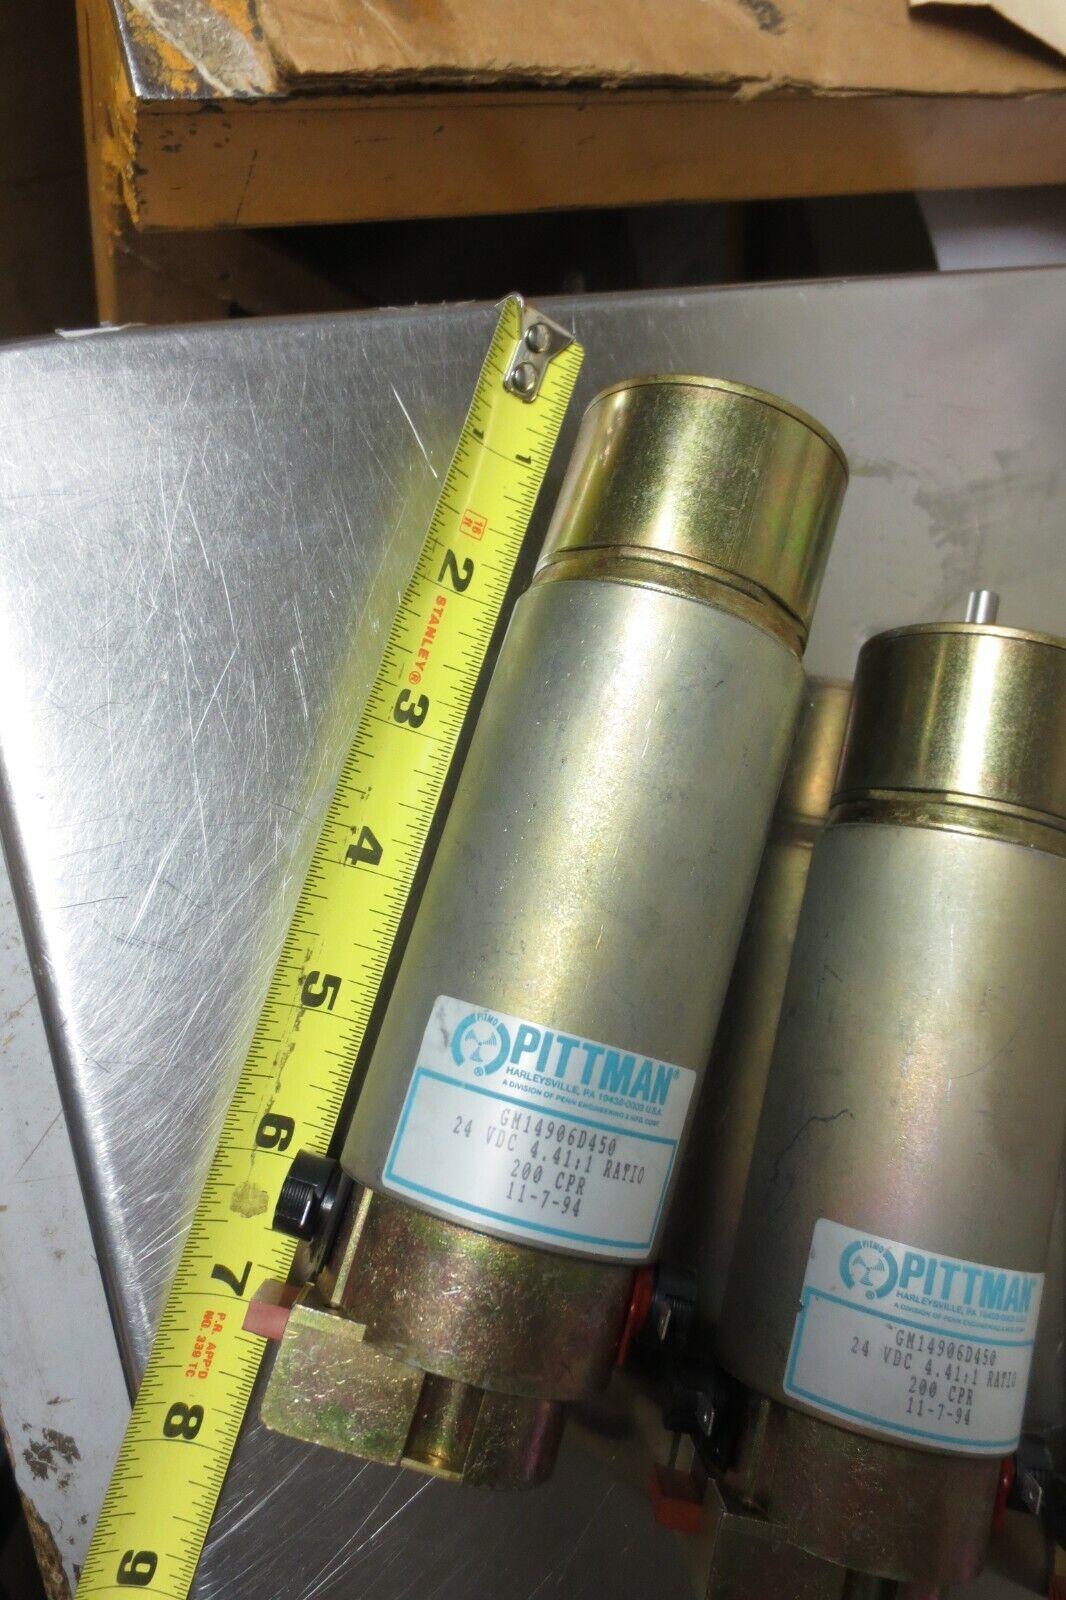 Pittman 14202D764 with 30 day warranty